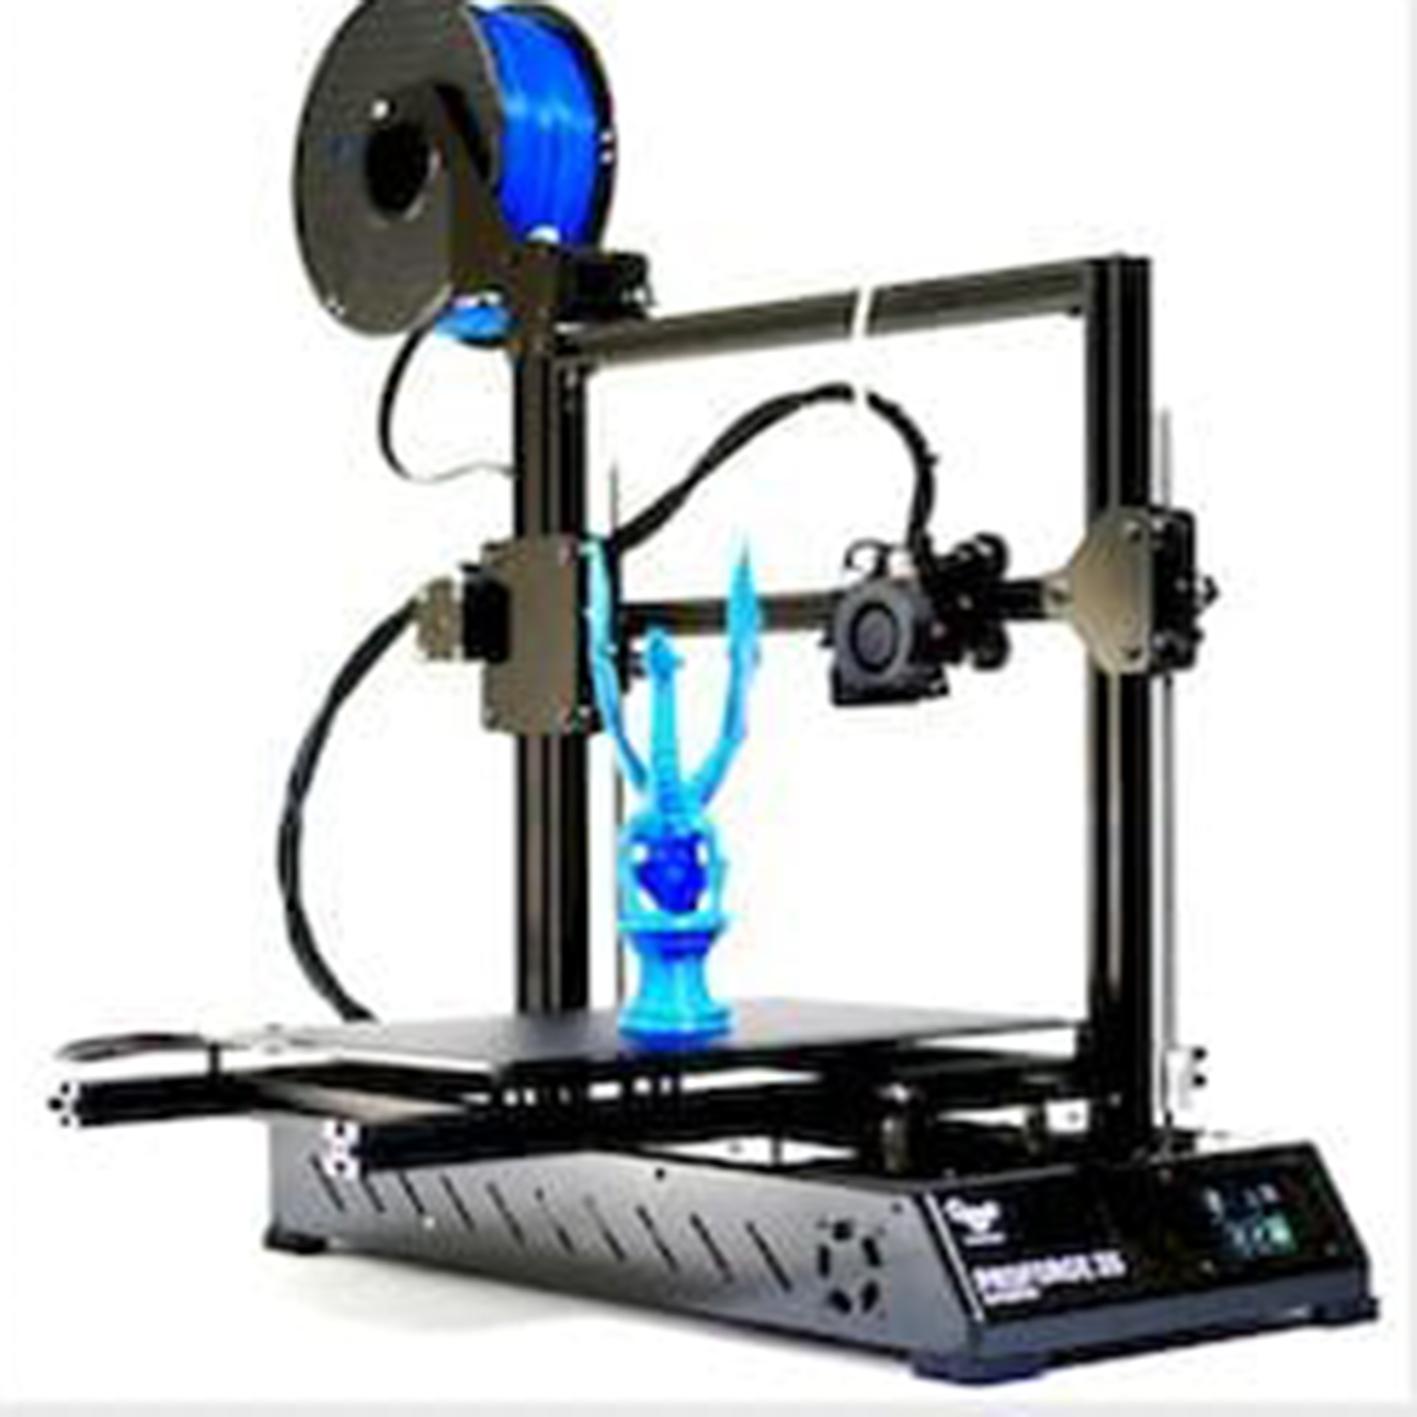 Zimple Zimpure Ziflex - Makertech Proforge